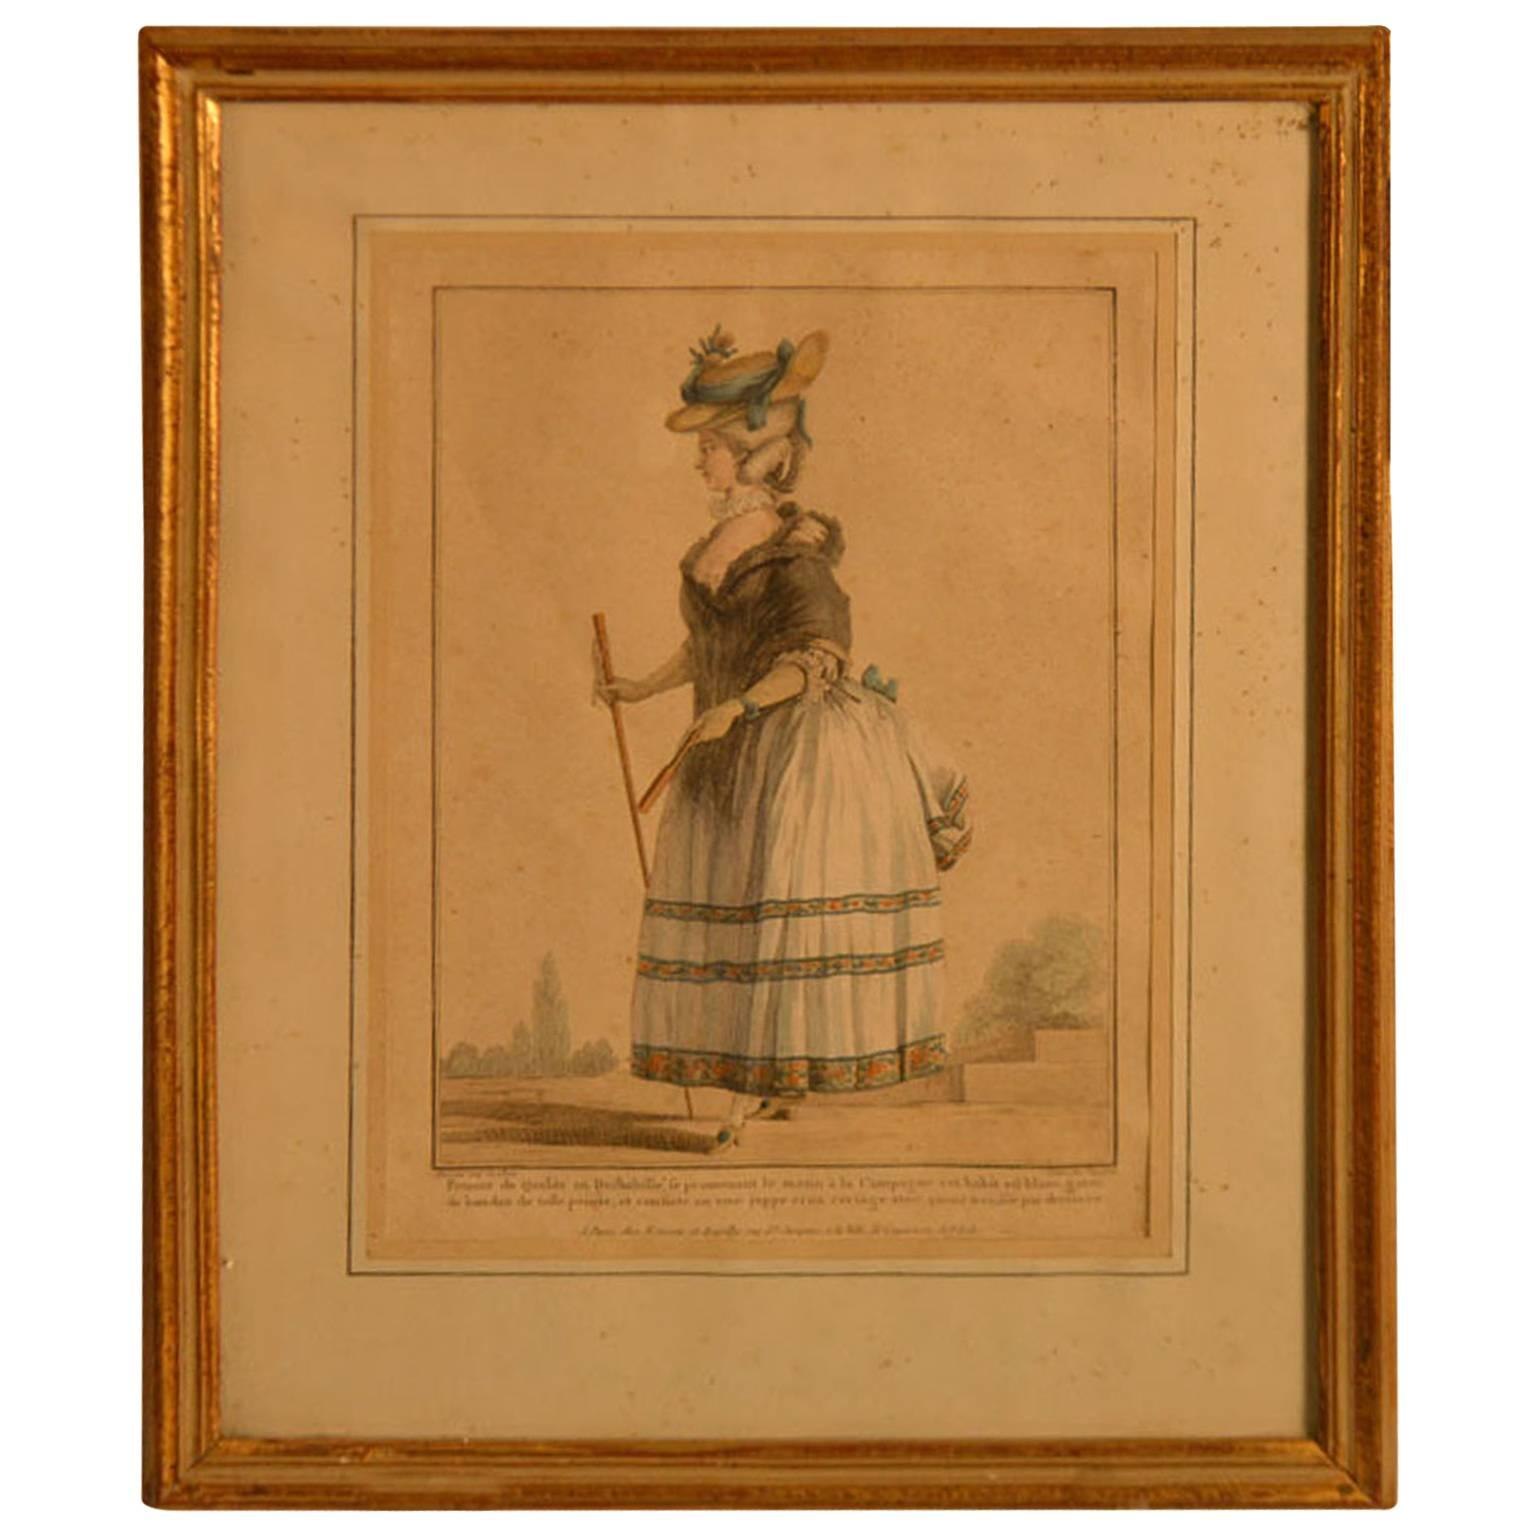 18th Century Framed Fashion Engraving